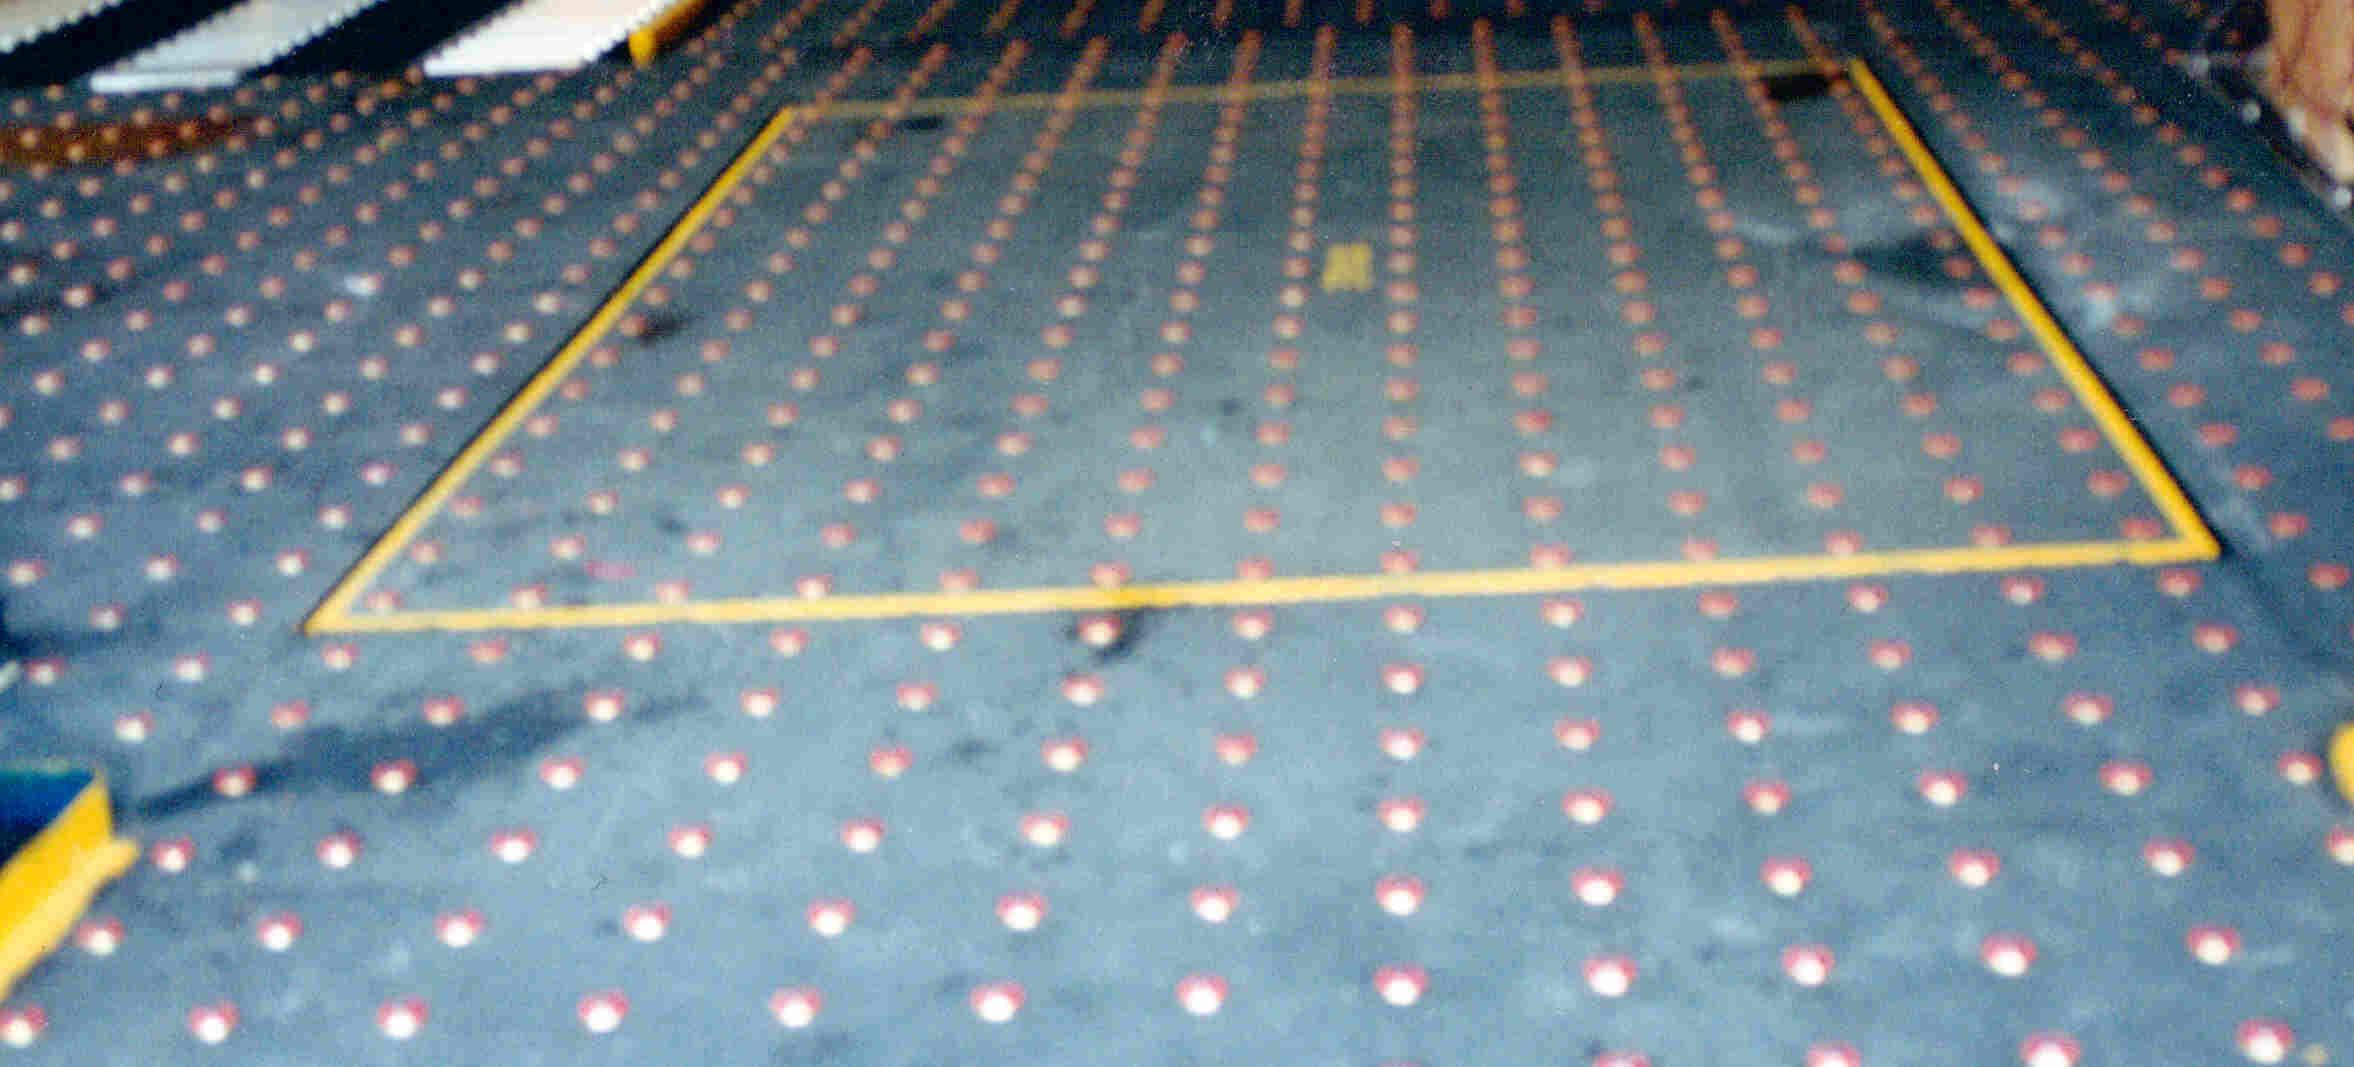 Ball Decks Efficiency Systems